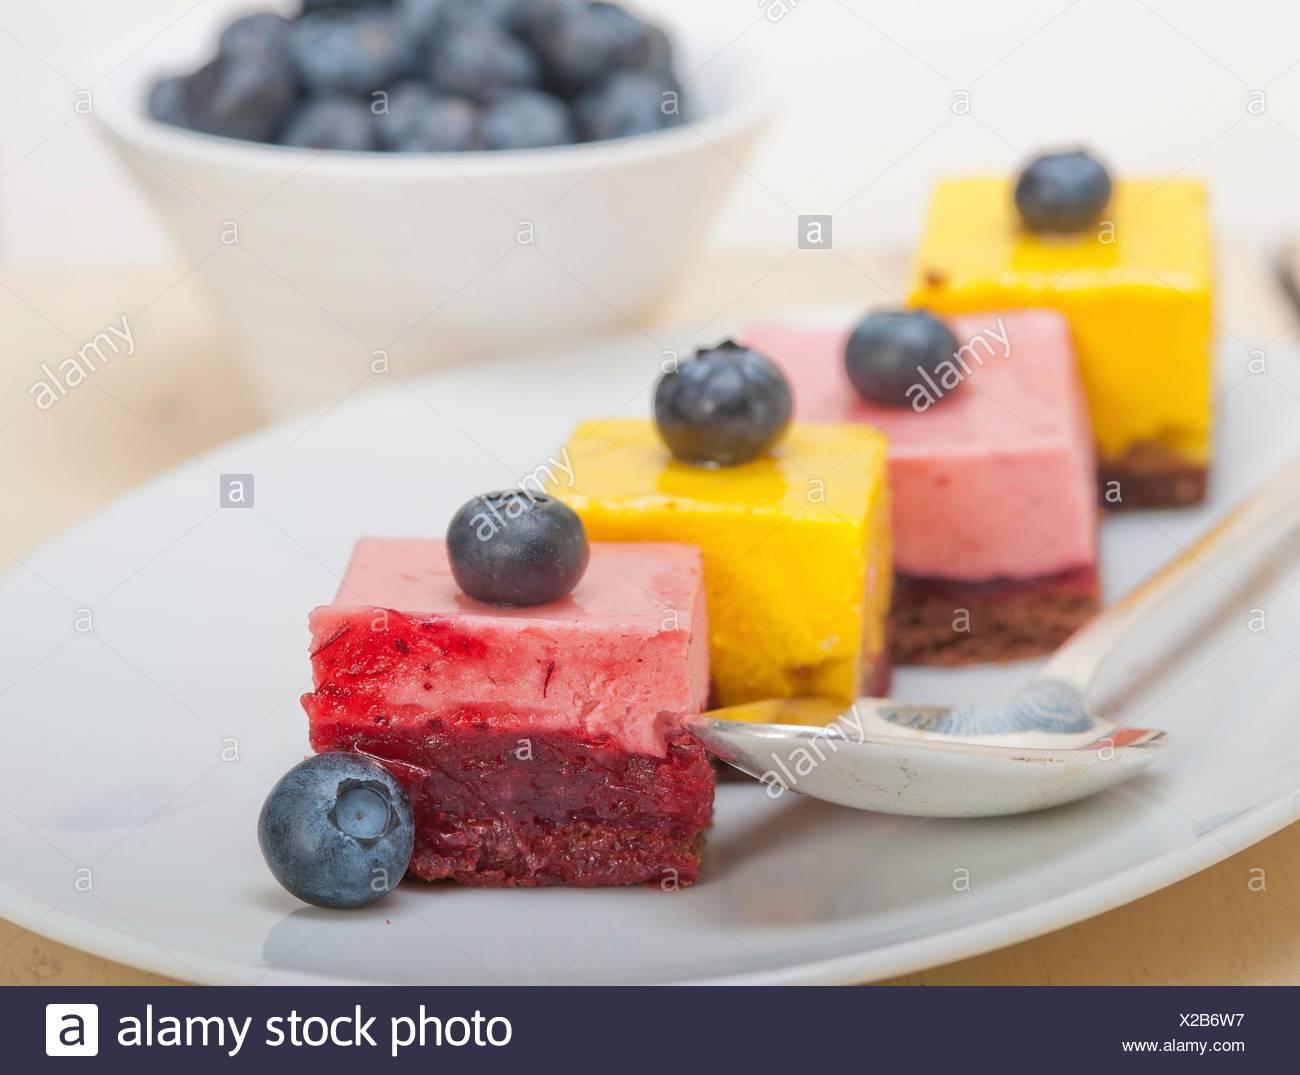 fresh strawberry and mango mousse dessert cake with blueberry. - Stock Image